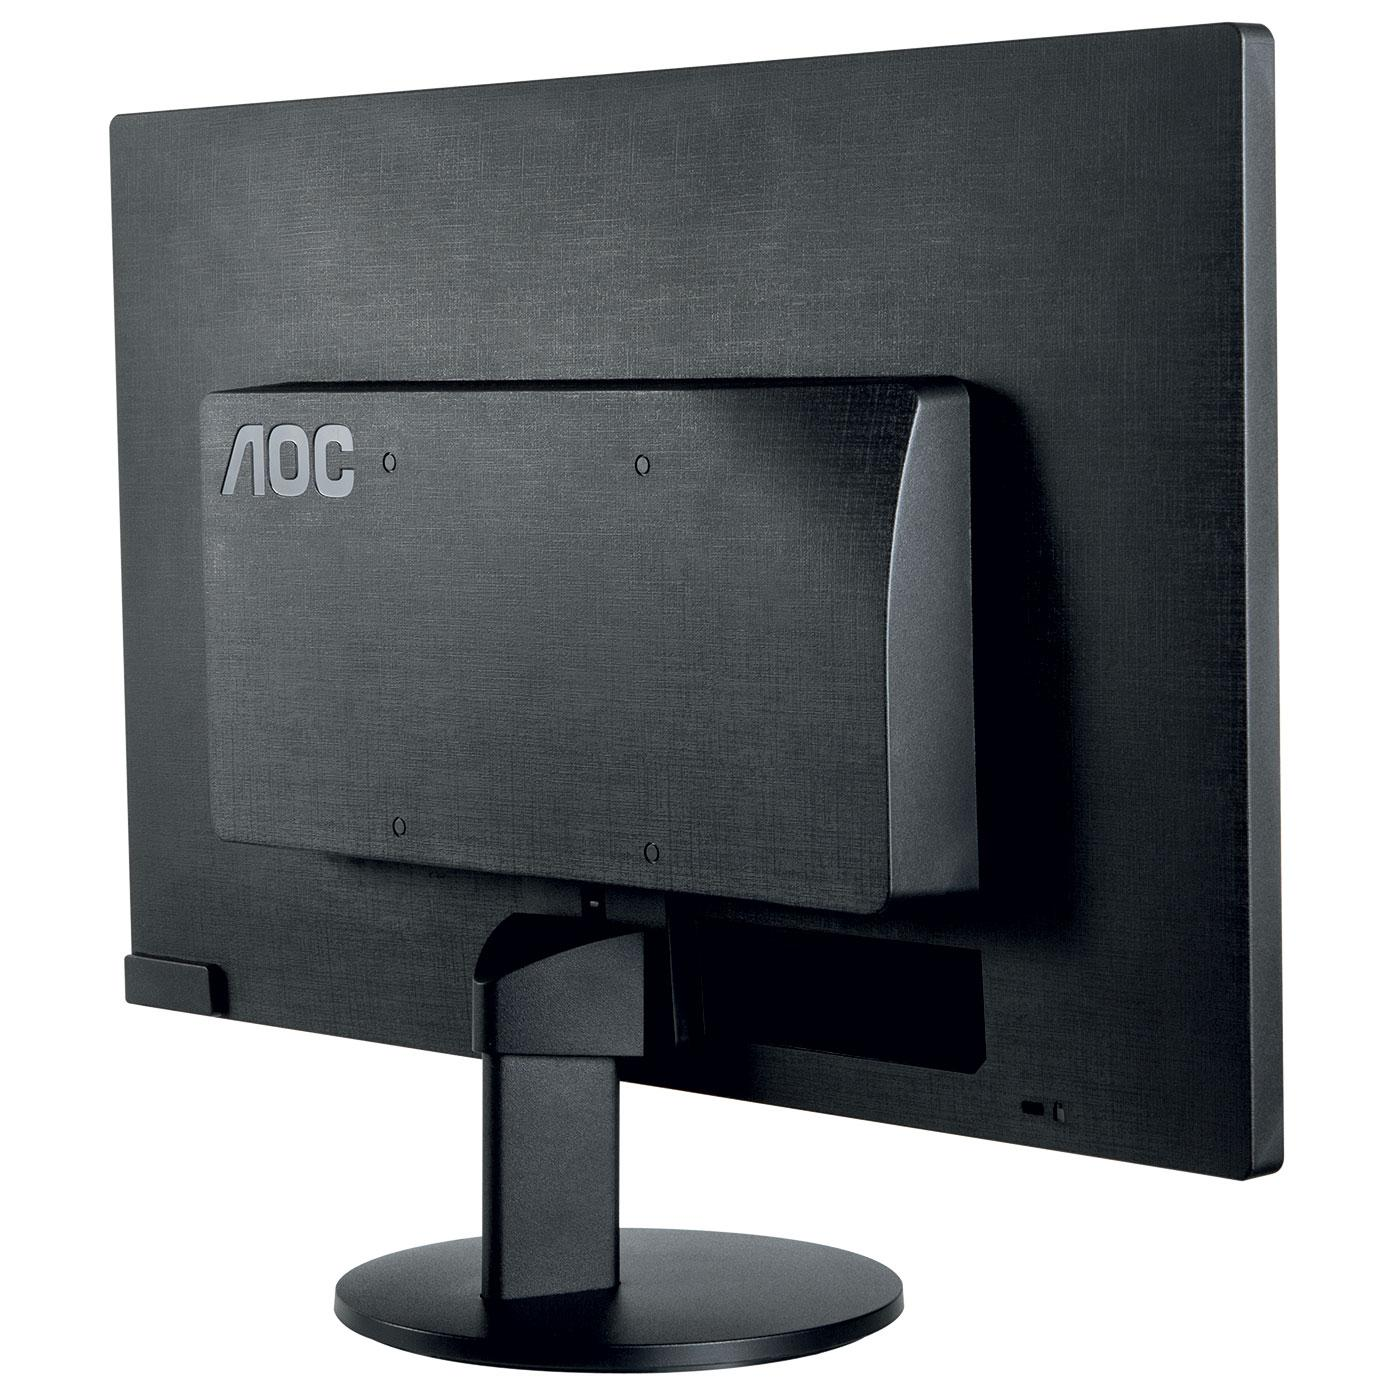 AOC - E2470SWDA - Ecran PC 23.6'' DVI,VGA et Hauts-parleur - Noir